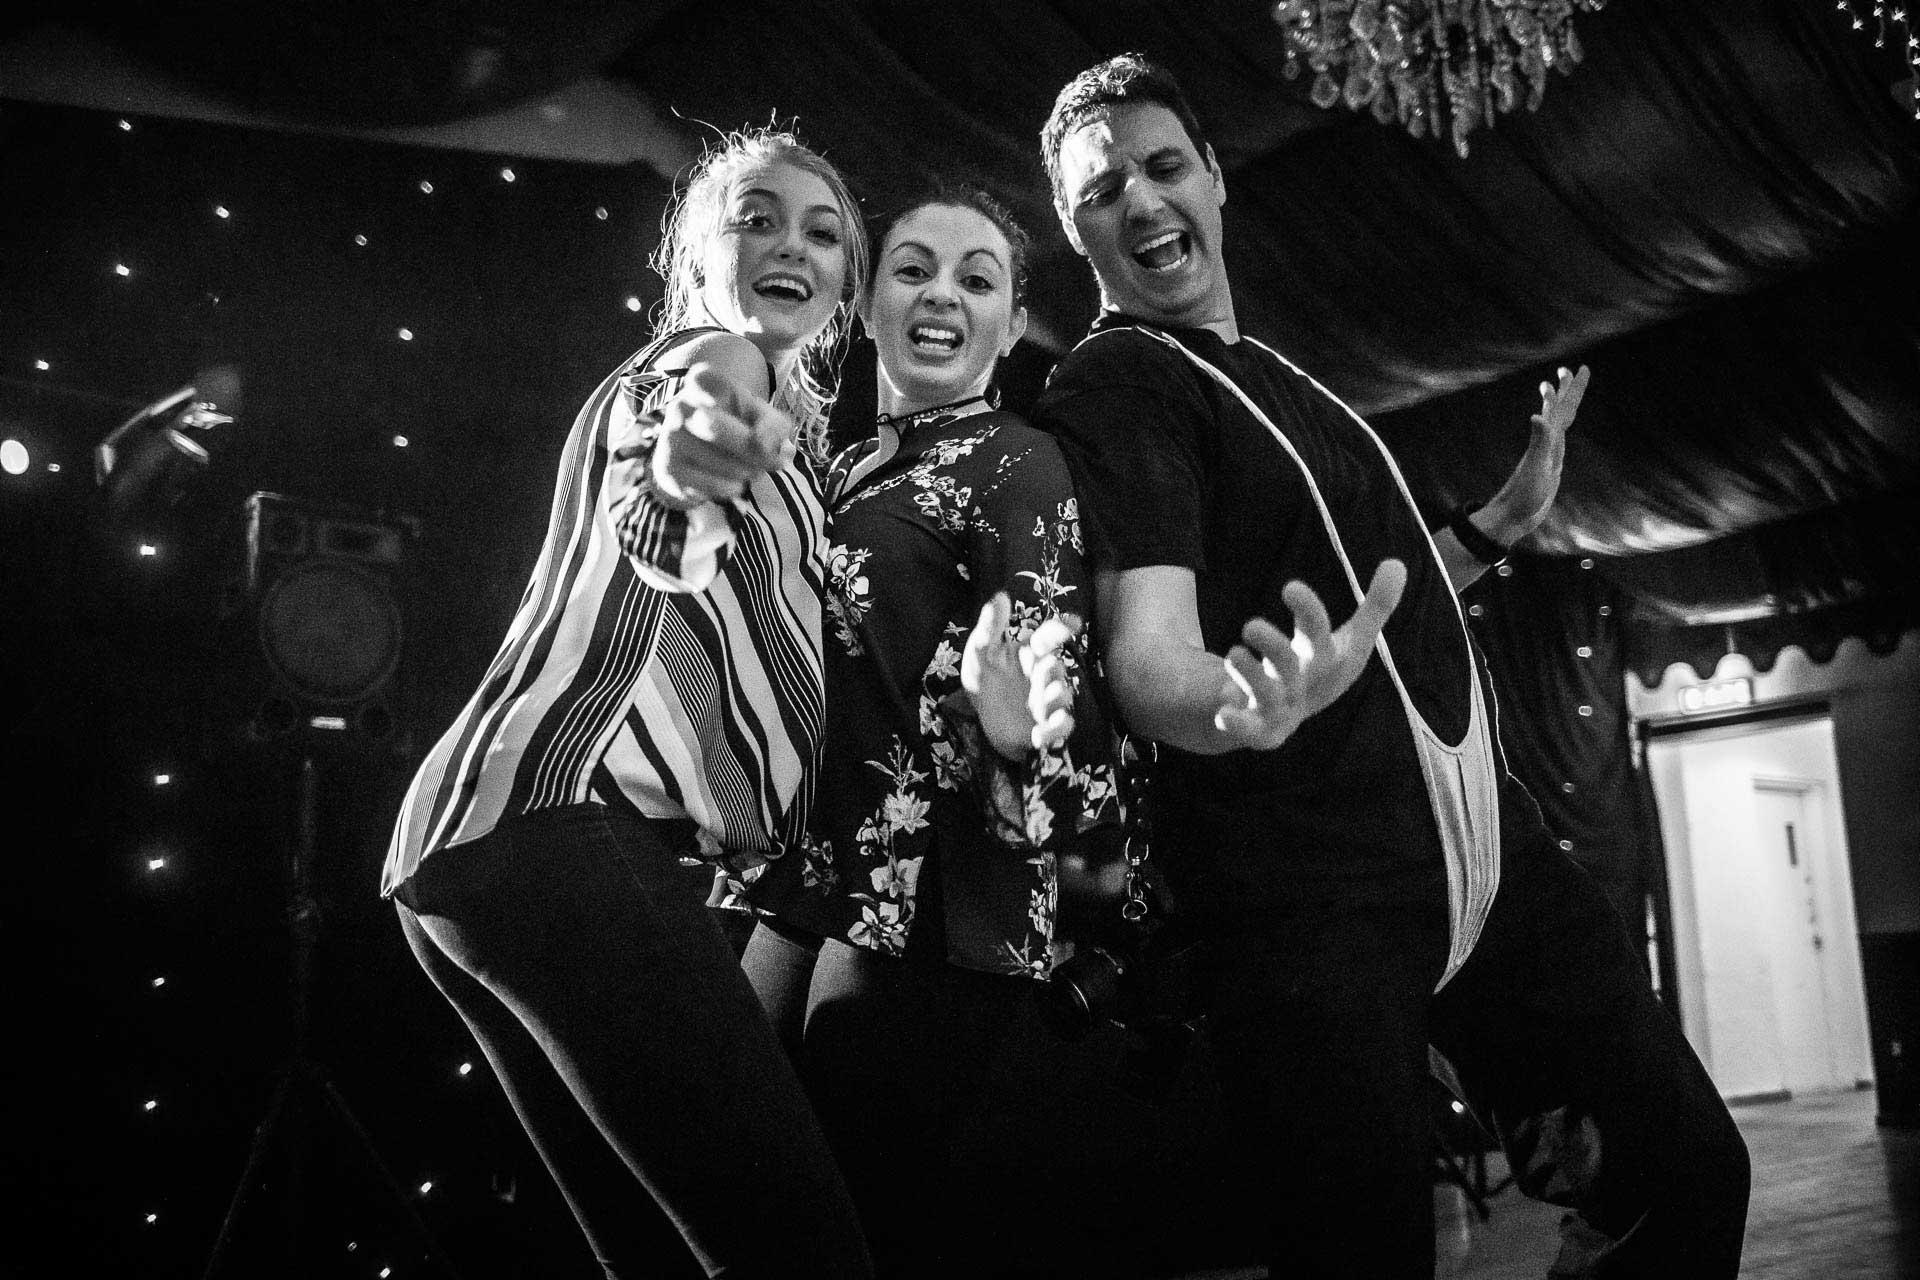 Rich Howman Wedding Photographer 2017 Behind the lens